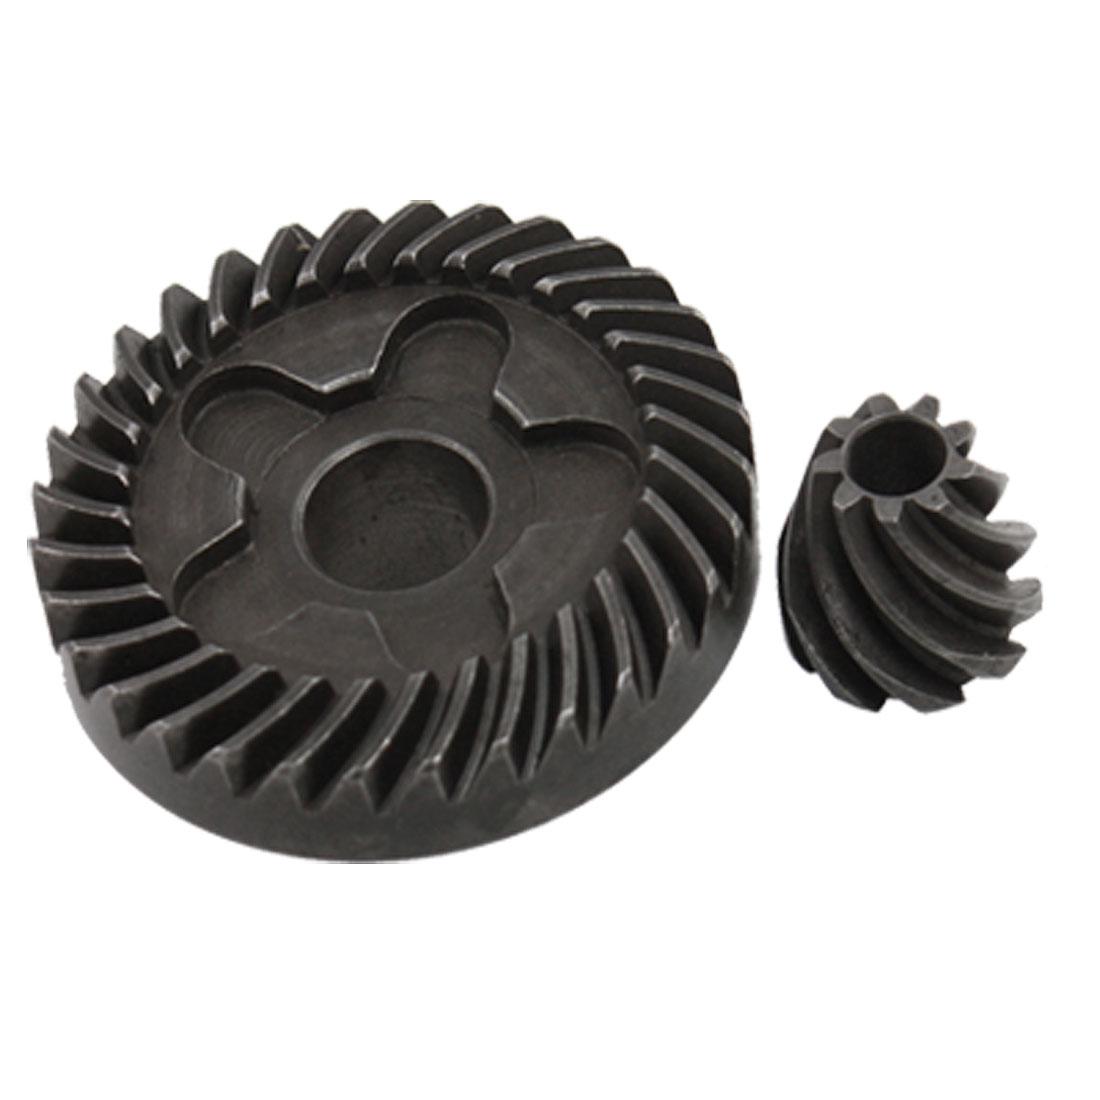 Angle Grinder Spiral Bevel Gear 2 Pcs Set for Bosch GWS 6-100